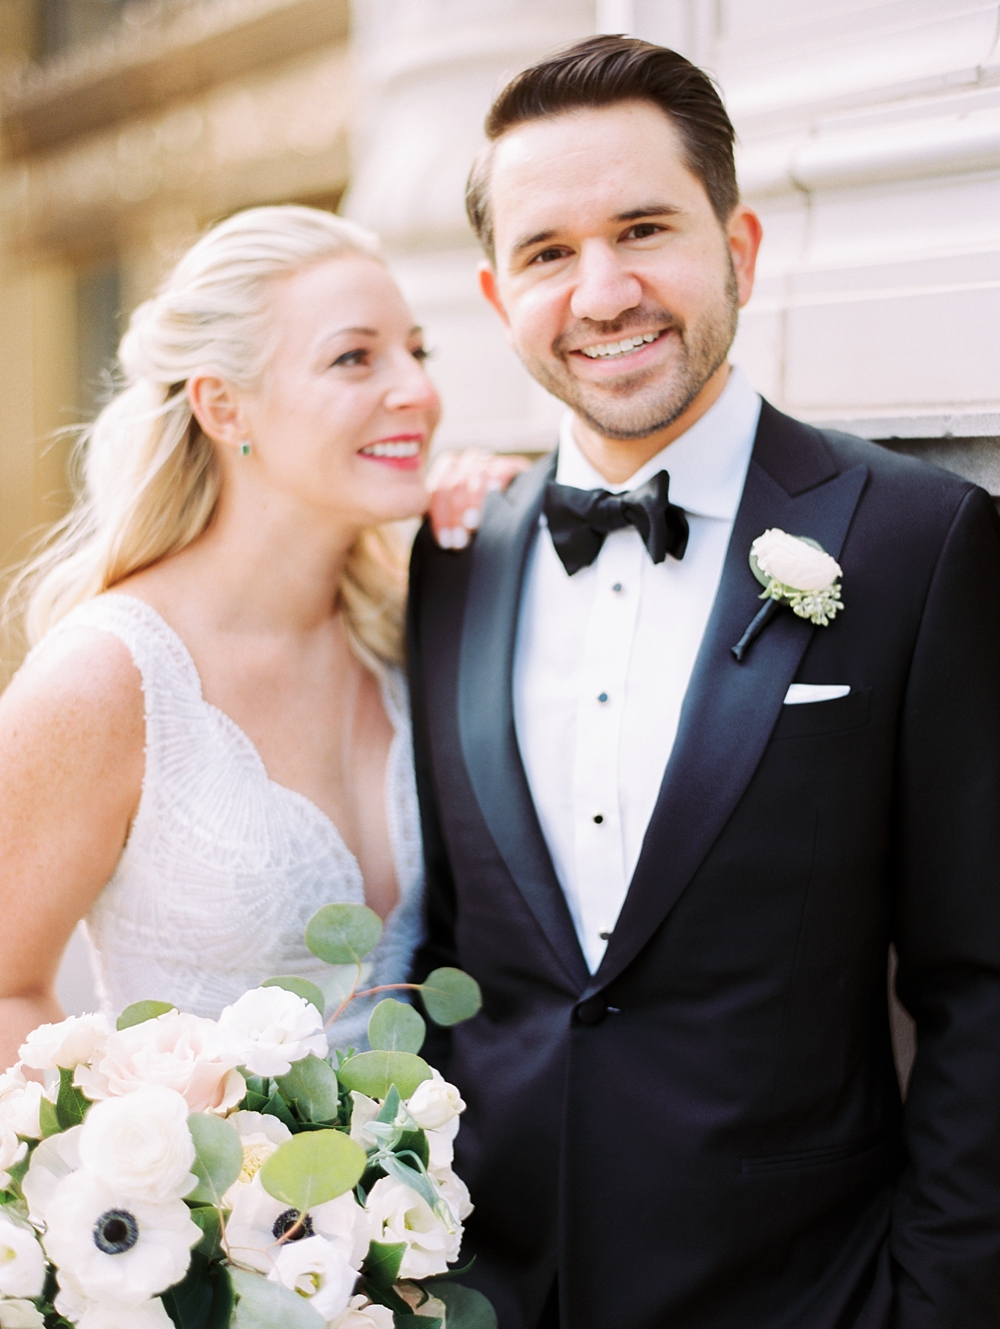 kristin-la-voie-photography-chicago-Wedding-Photographer-kimpton-gray-hotel-48